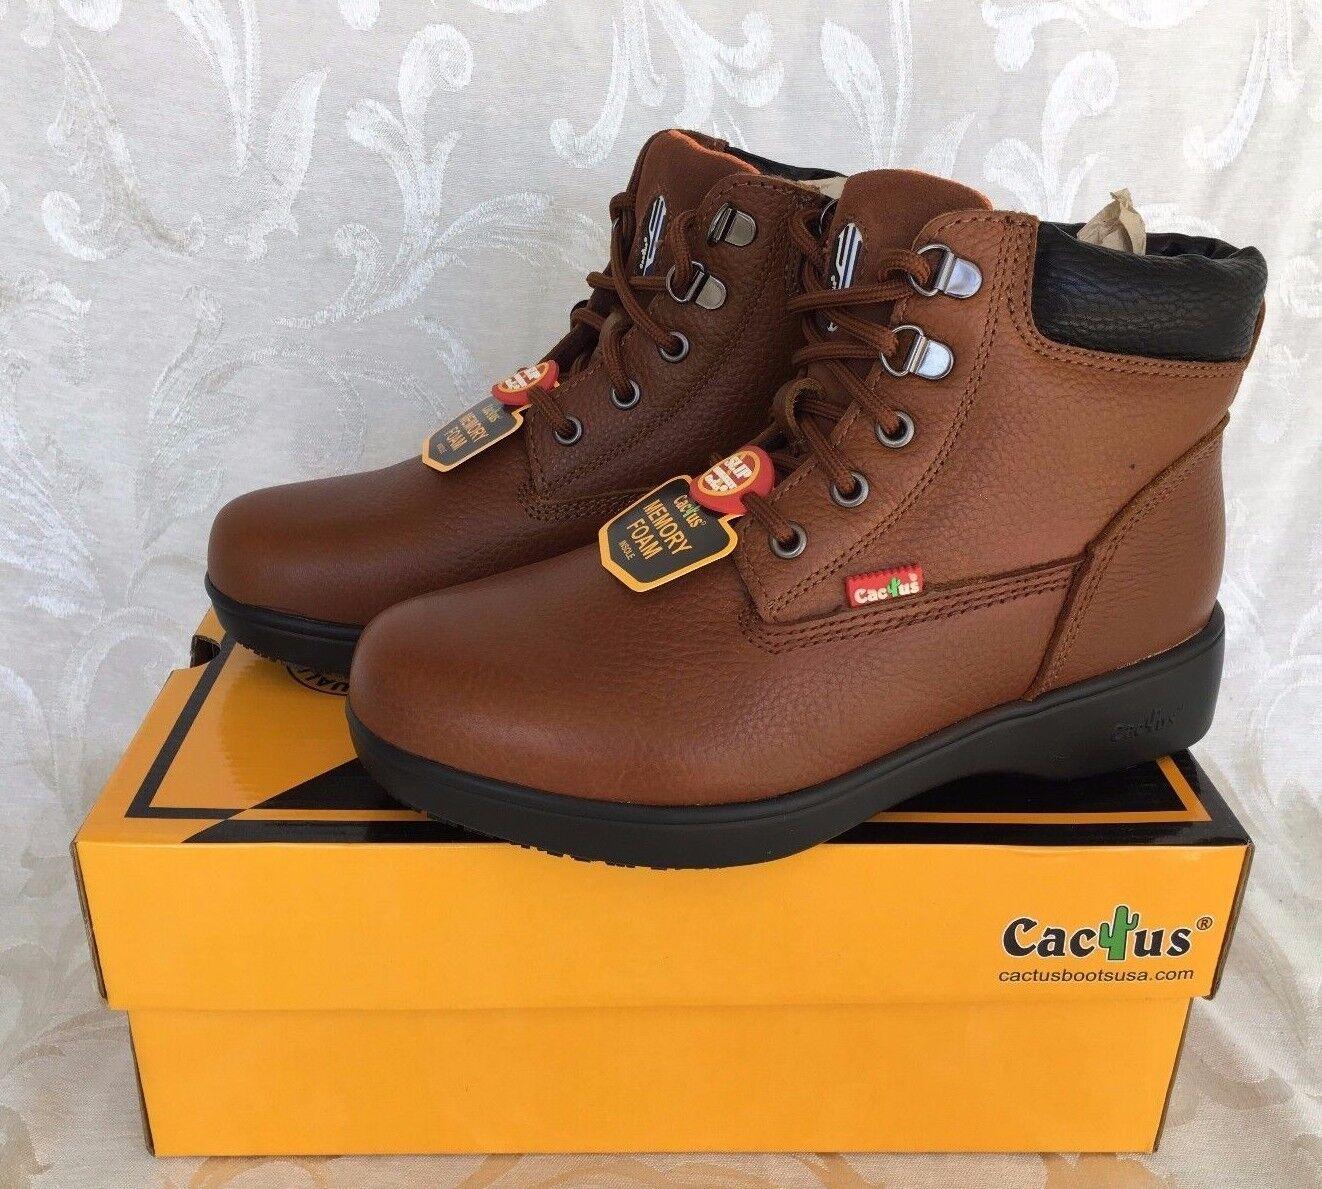 Cactus Women's 6  LS60 Light Brown Slip-Resistant Boots Memory Foam Insole Work